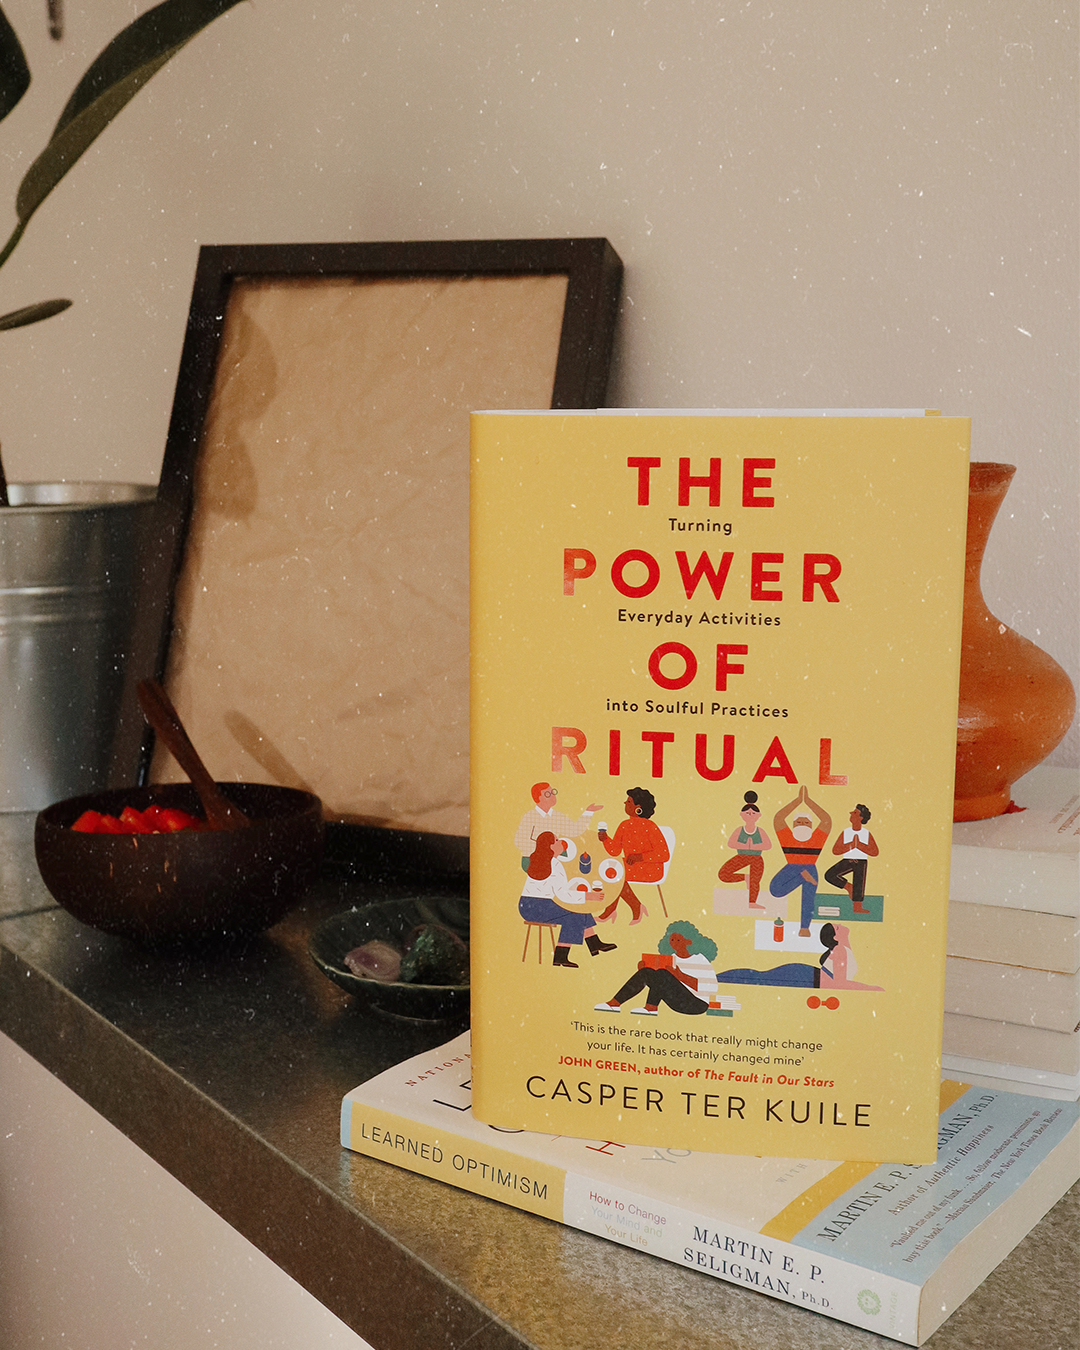 The Power of Ritual: så skapar du en kreativ ritual & sabbat